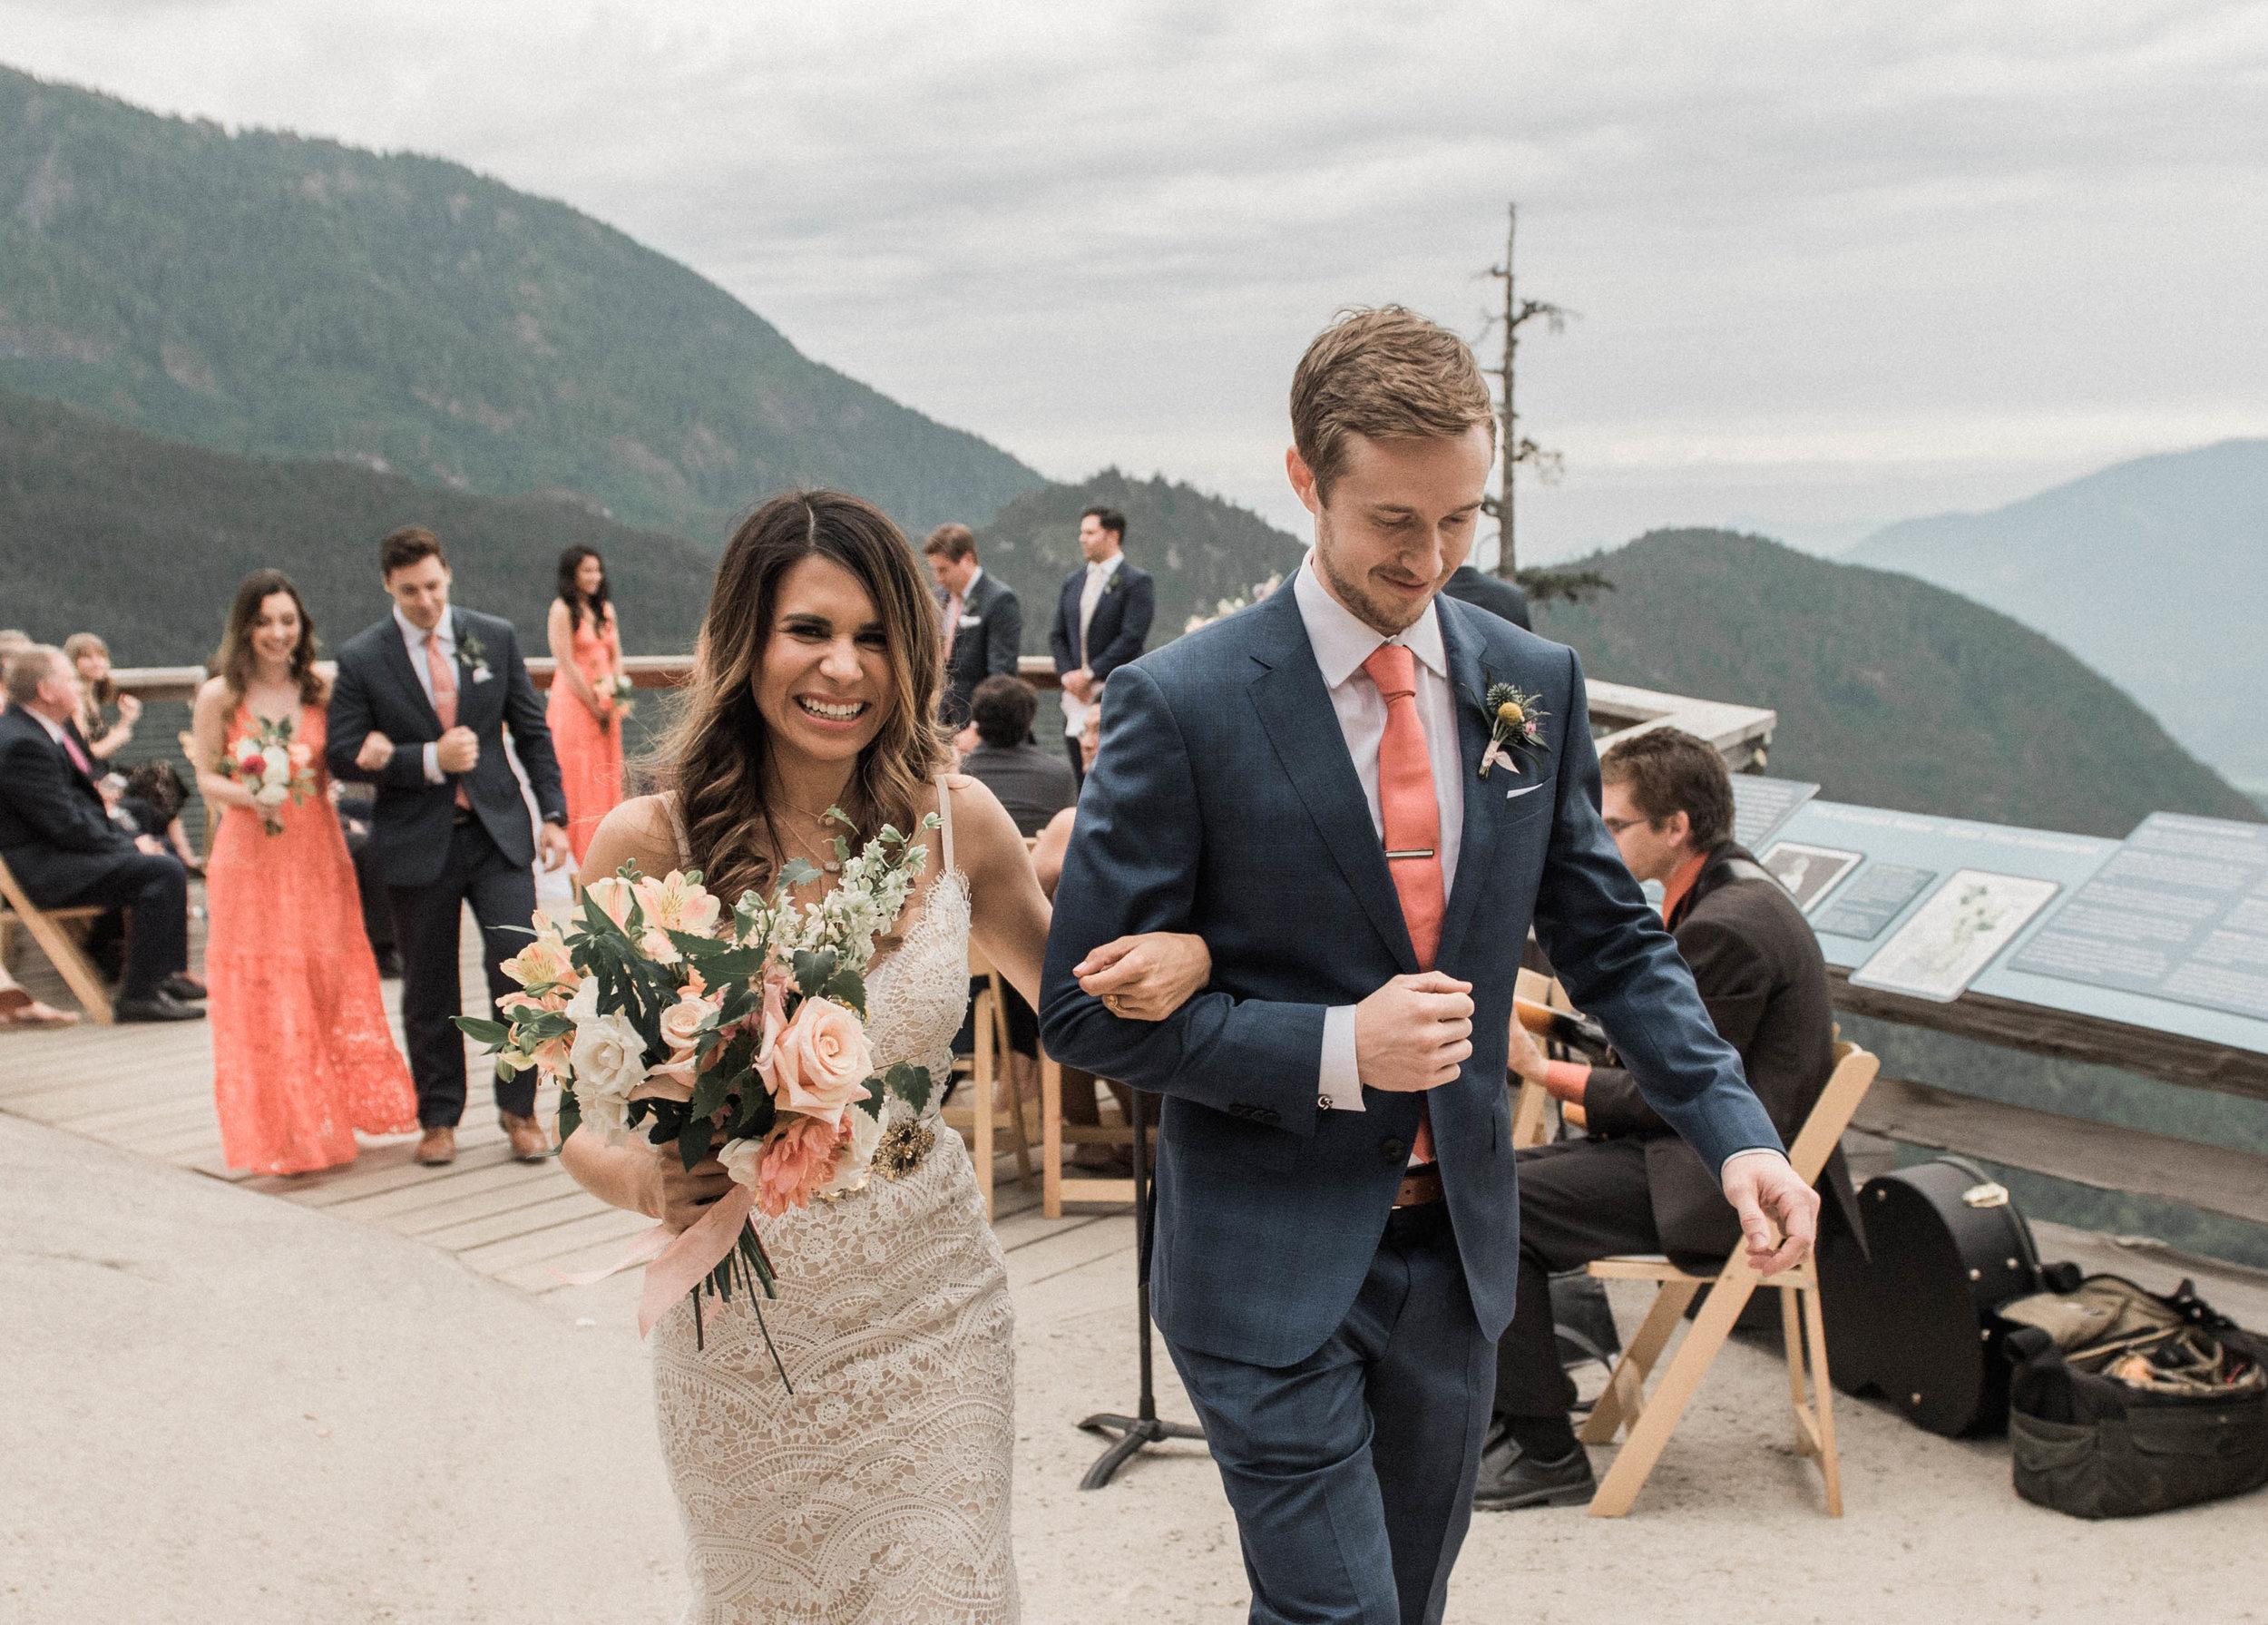 austin-texas-wedding-photography-1778-photographie-97.jpg